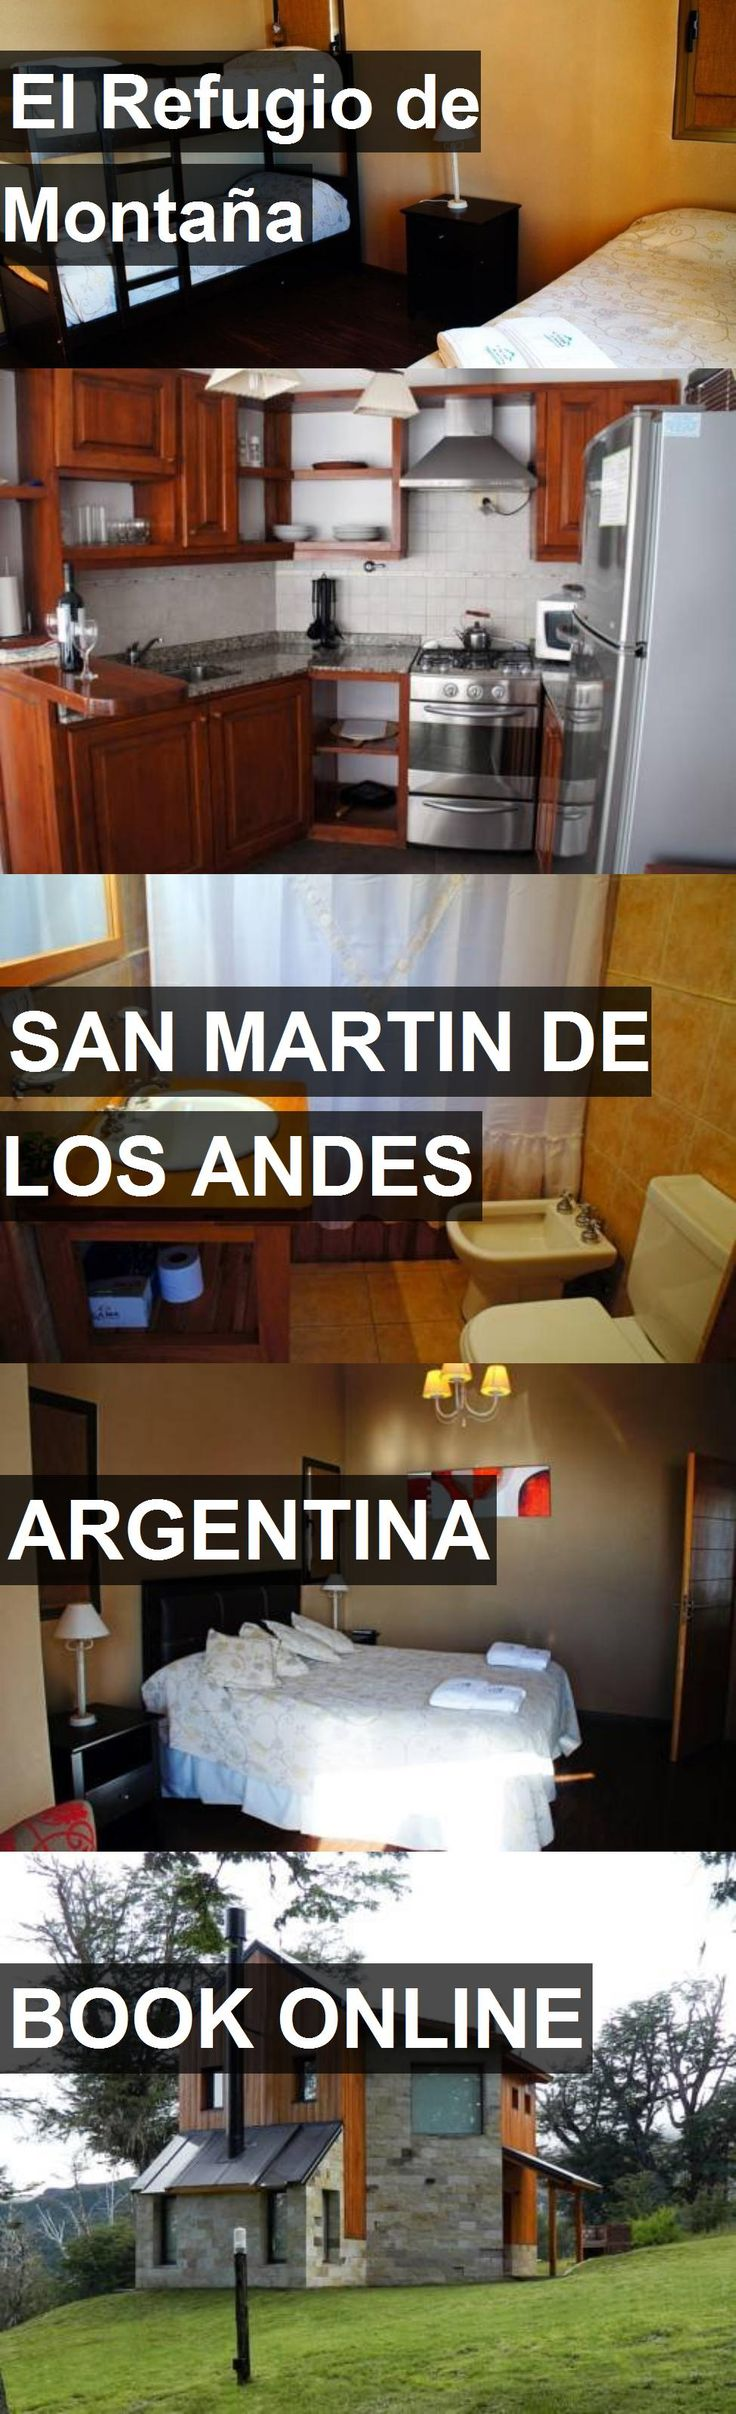 Hotel El Refugio de Montaña in San Martin De Los Andes, Argentina. For more information, photos, reviews and best prices please follow the link. #Argentina #SanMartinDeLosAndes #travel #vacation #hotel